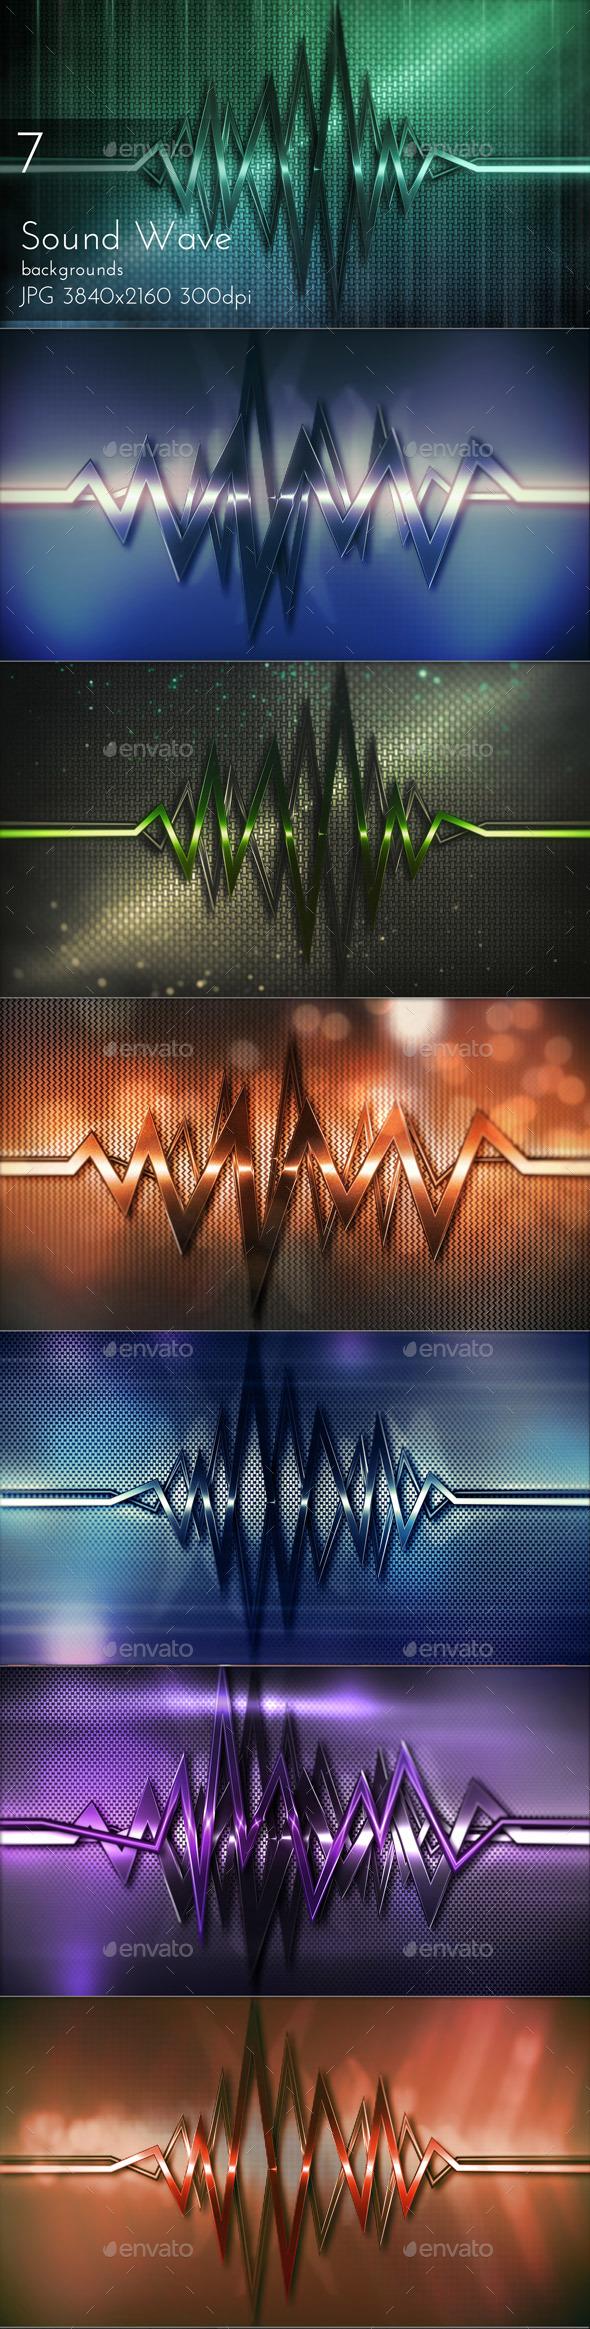 Sound Wave - Tech / Futuristic Backgrounds